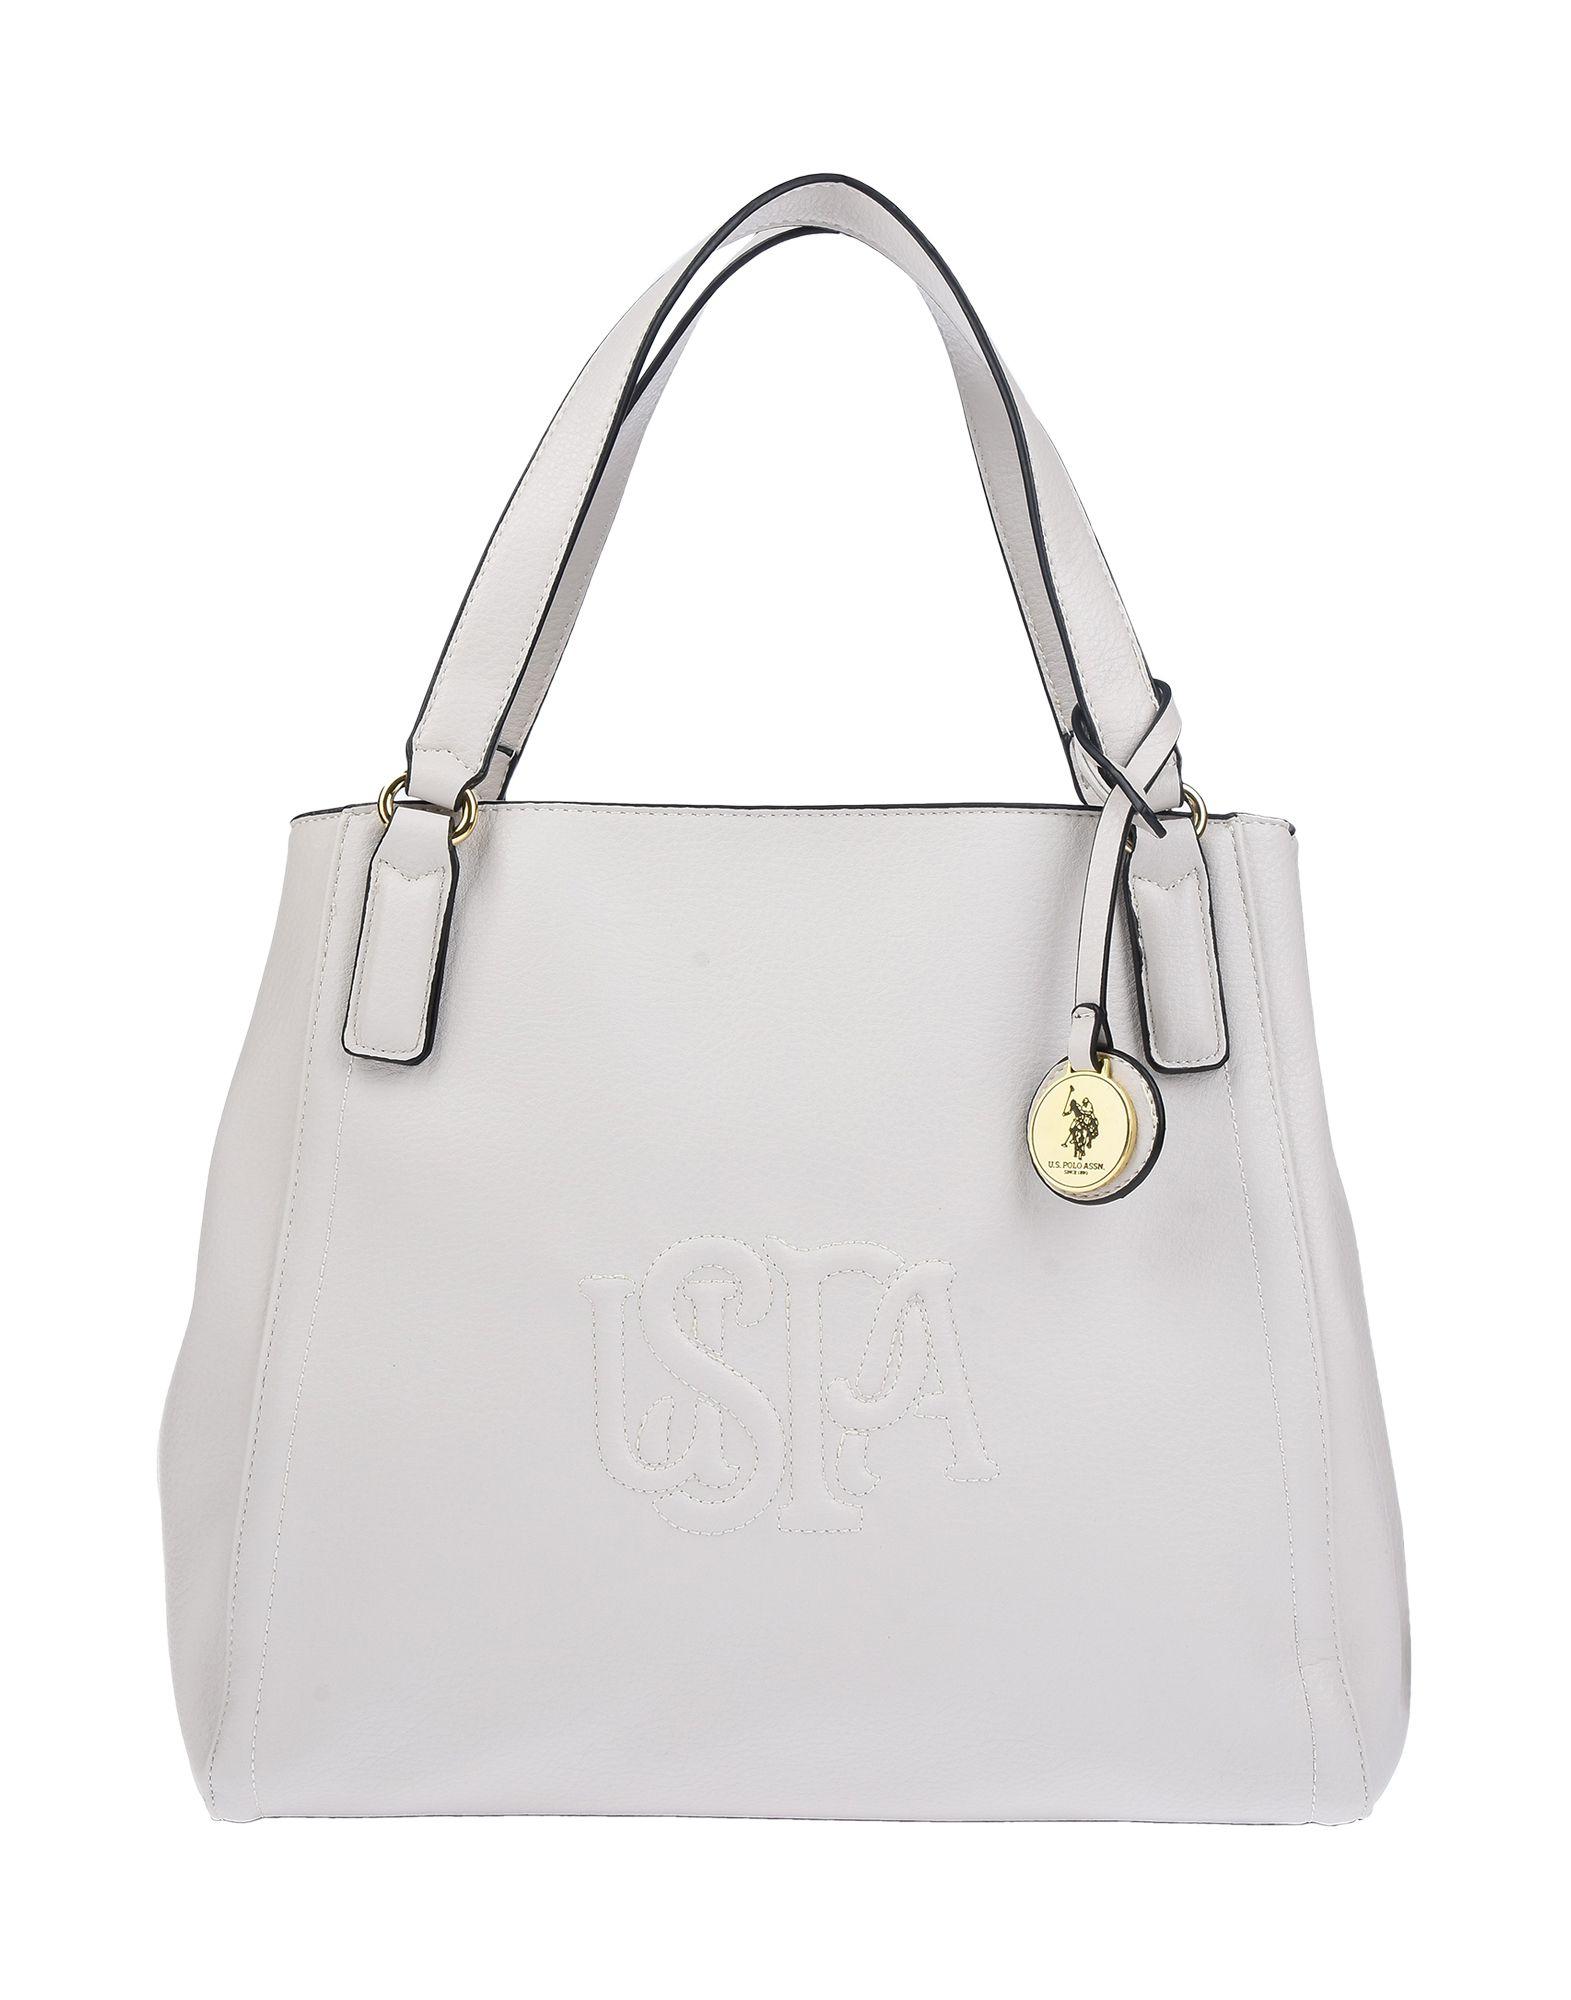 U.S.Polo Assn. Bags - U.S.Polo Assn. Women - YOOX United Kingdom c1615ec52f1c0